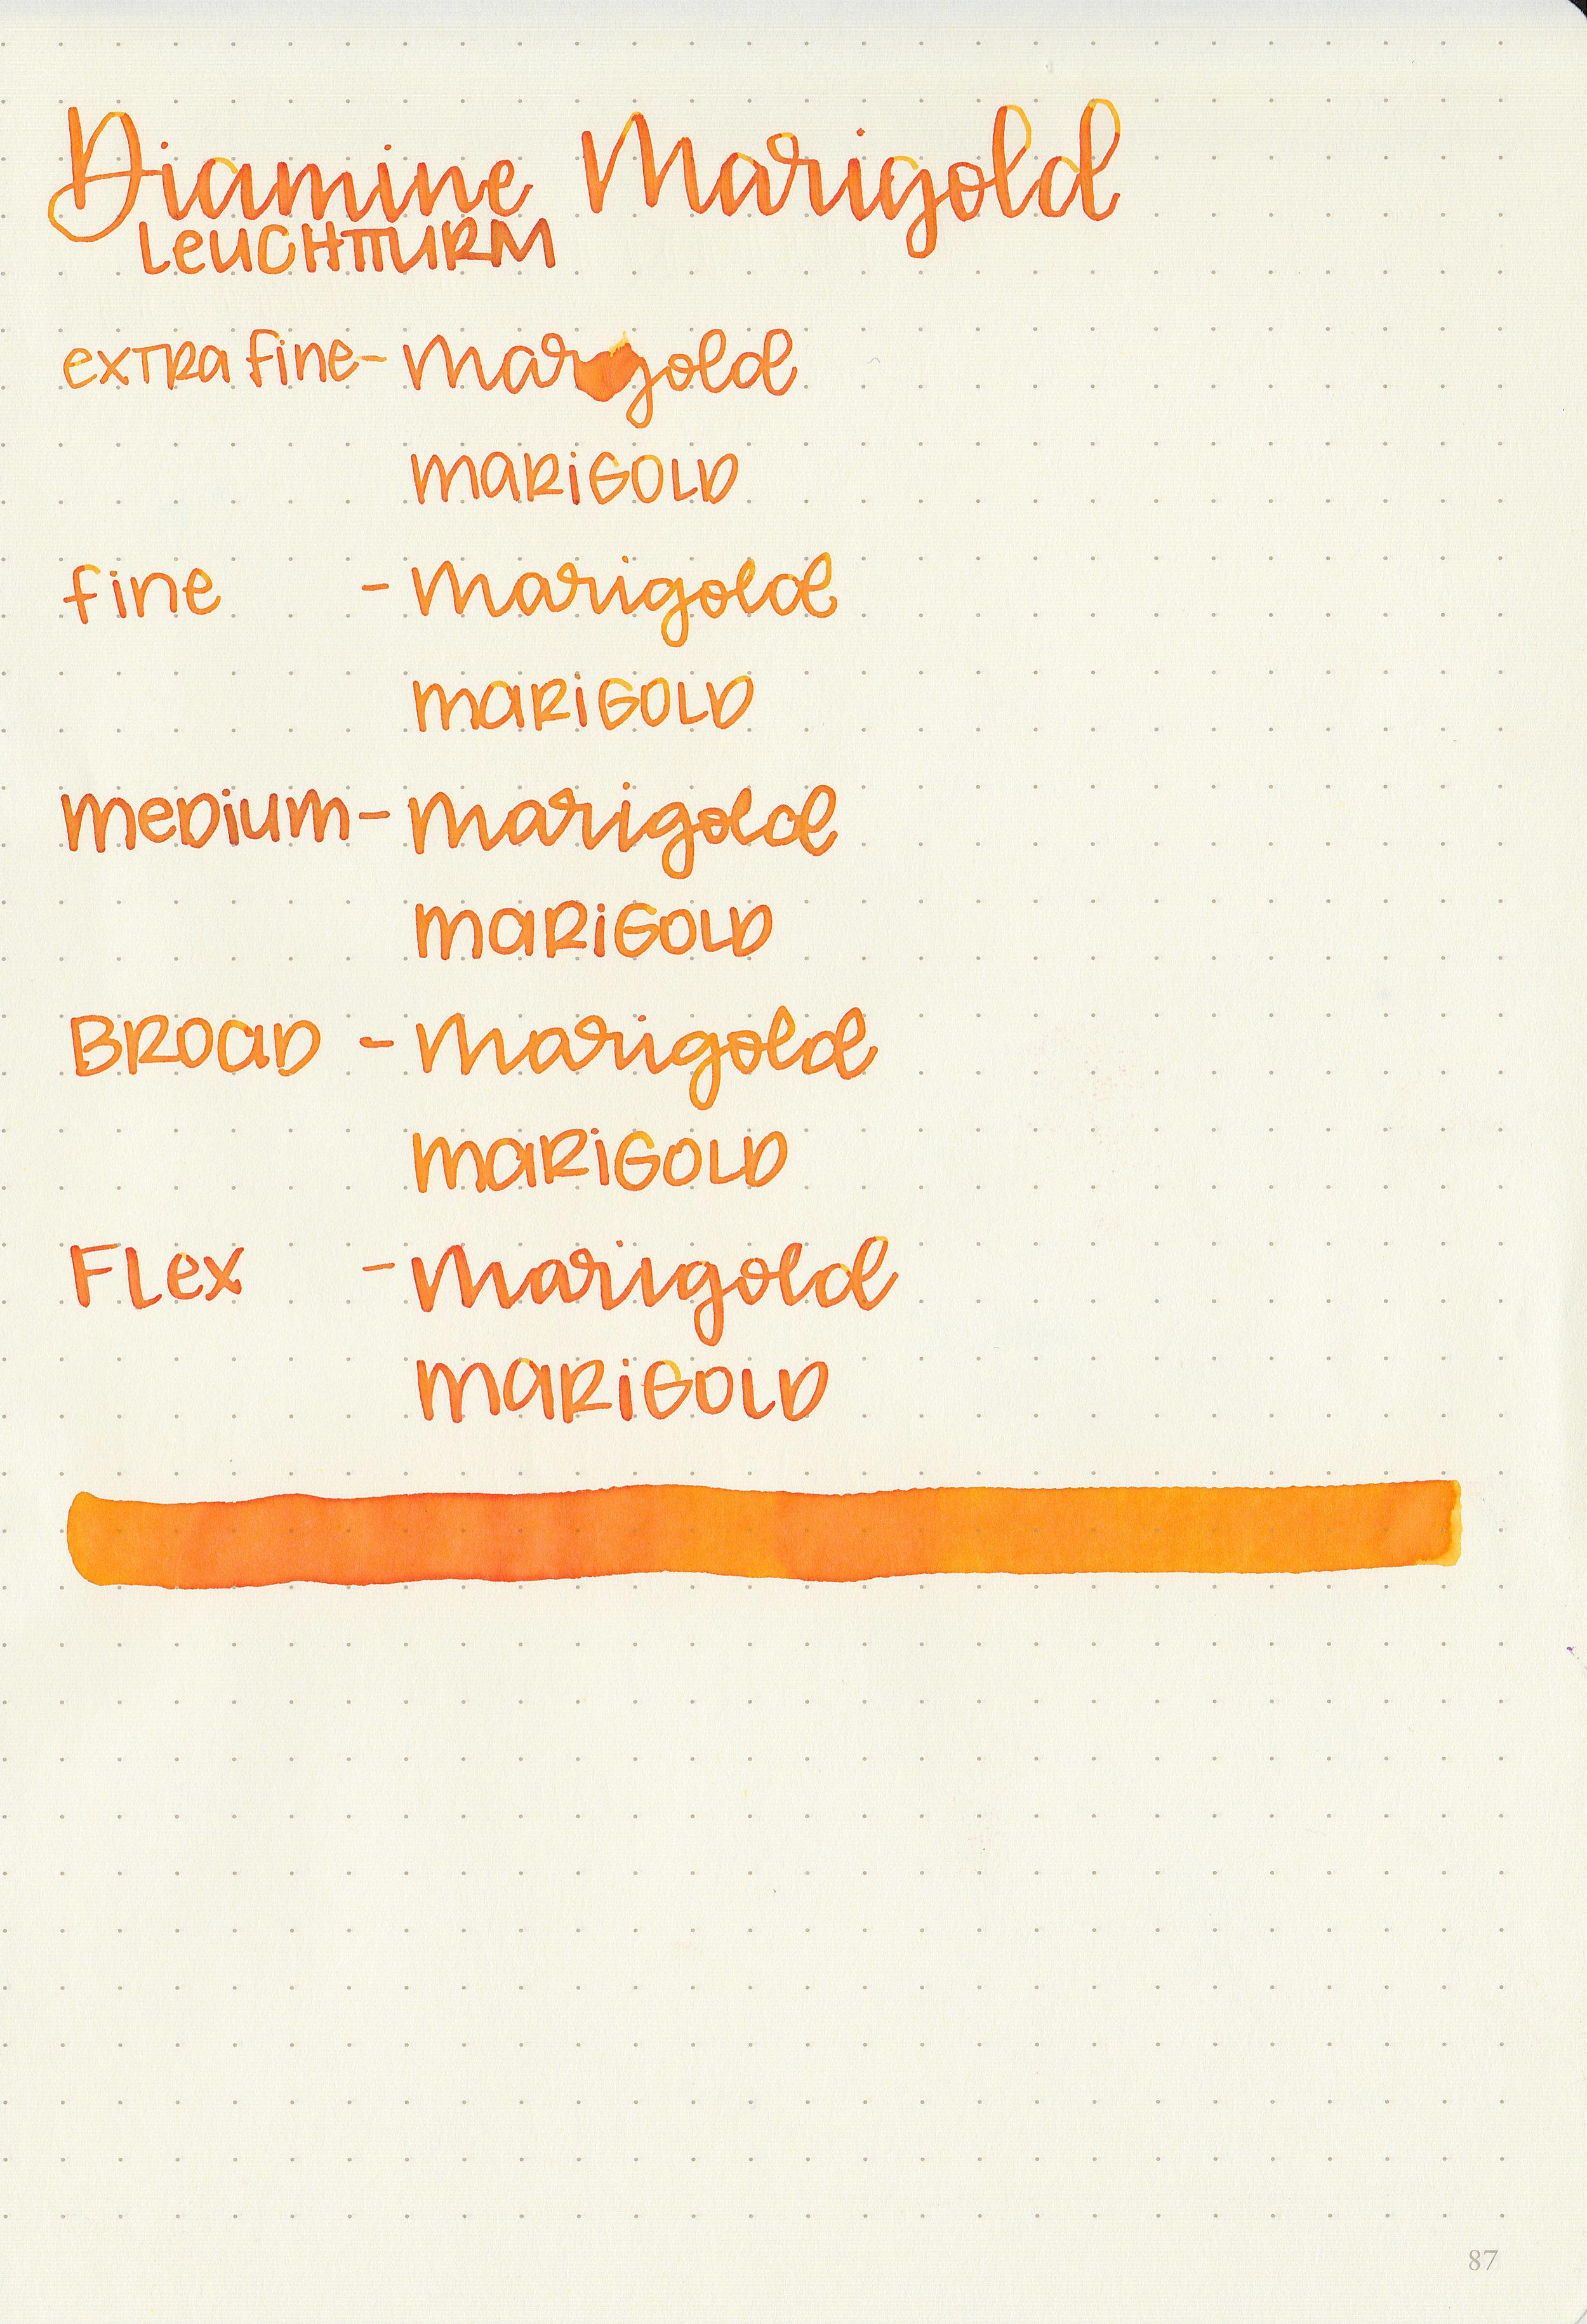 d-marigold-9.jpg